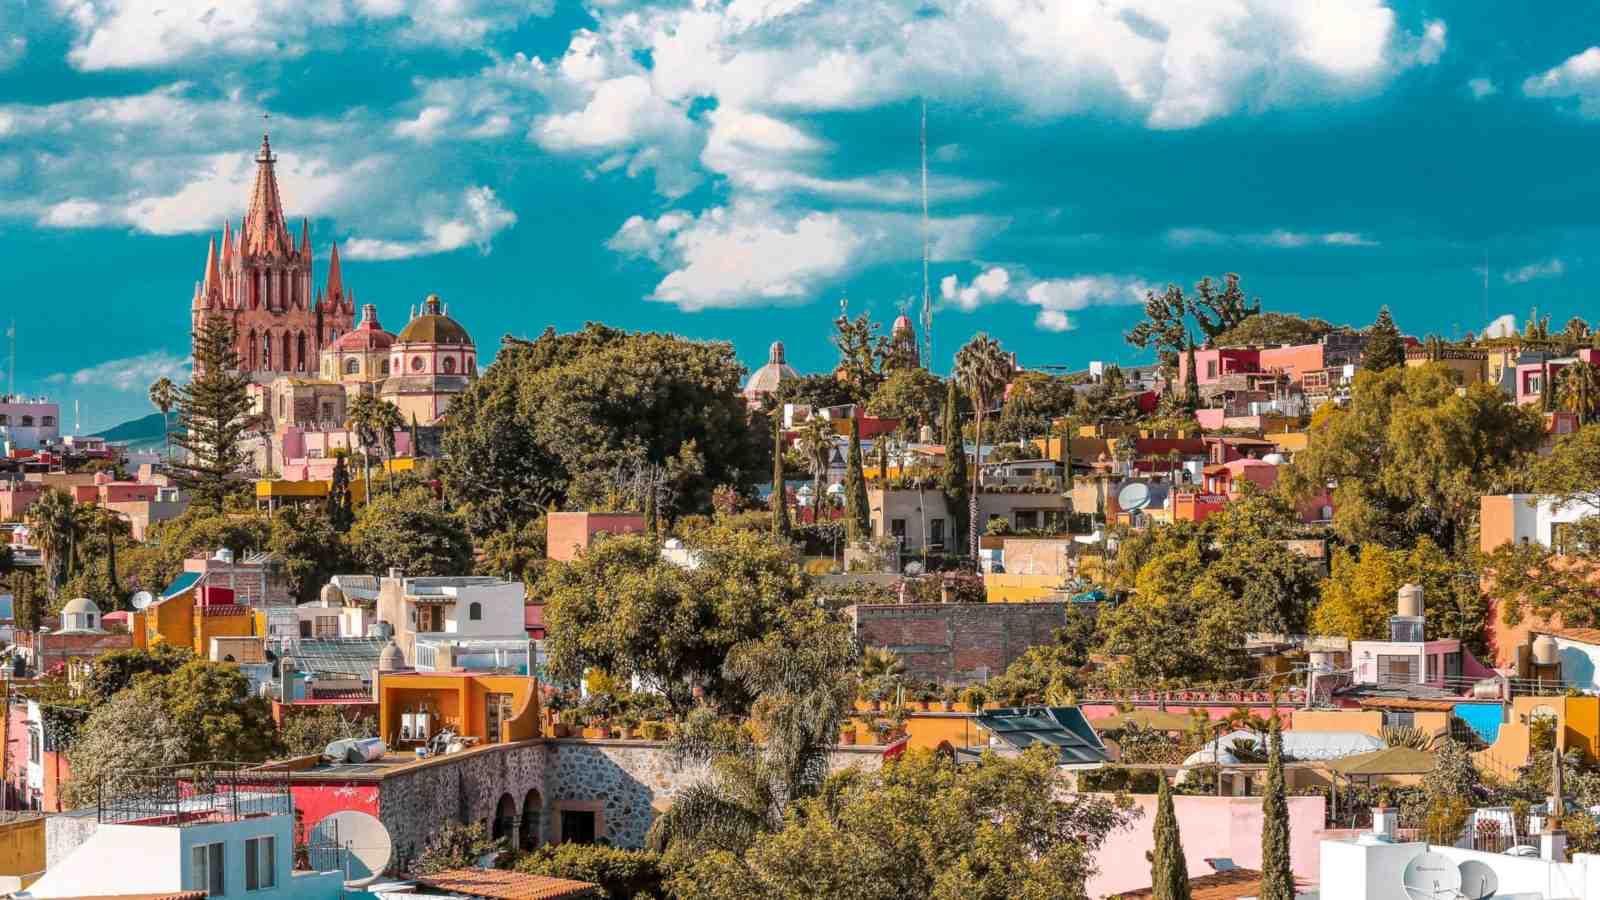 Ürgüp ile San Miguel kardeş şehir oldu